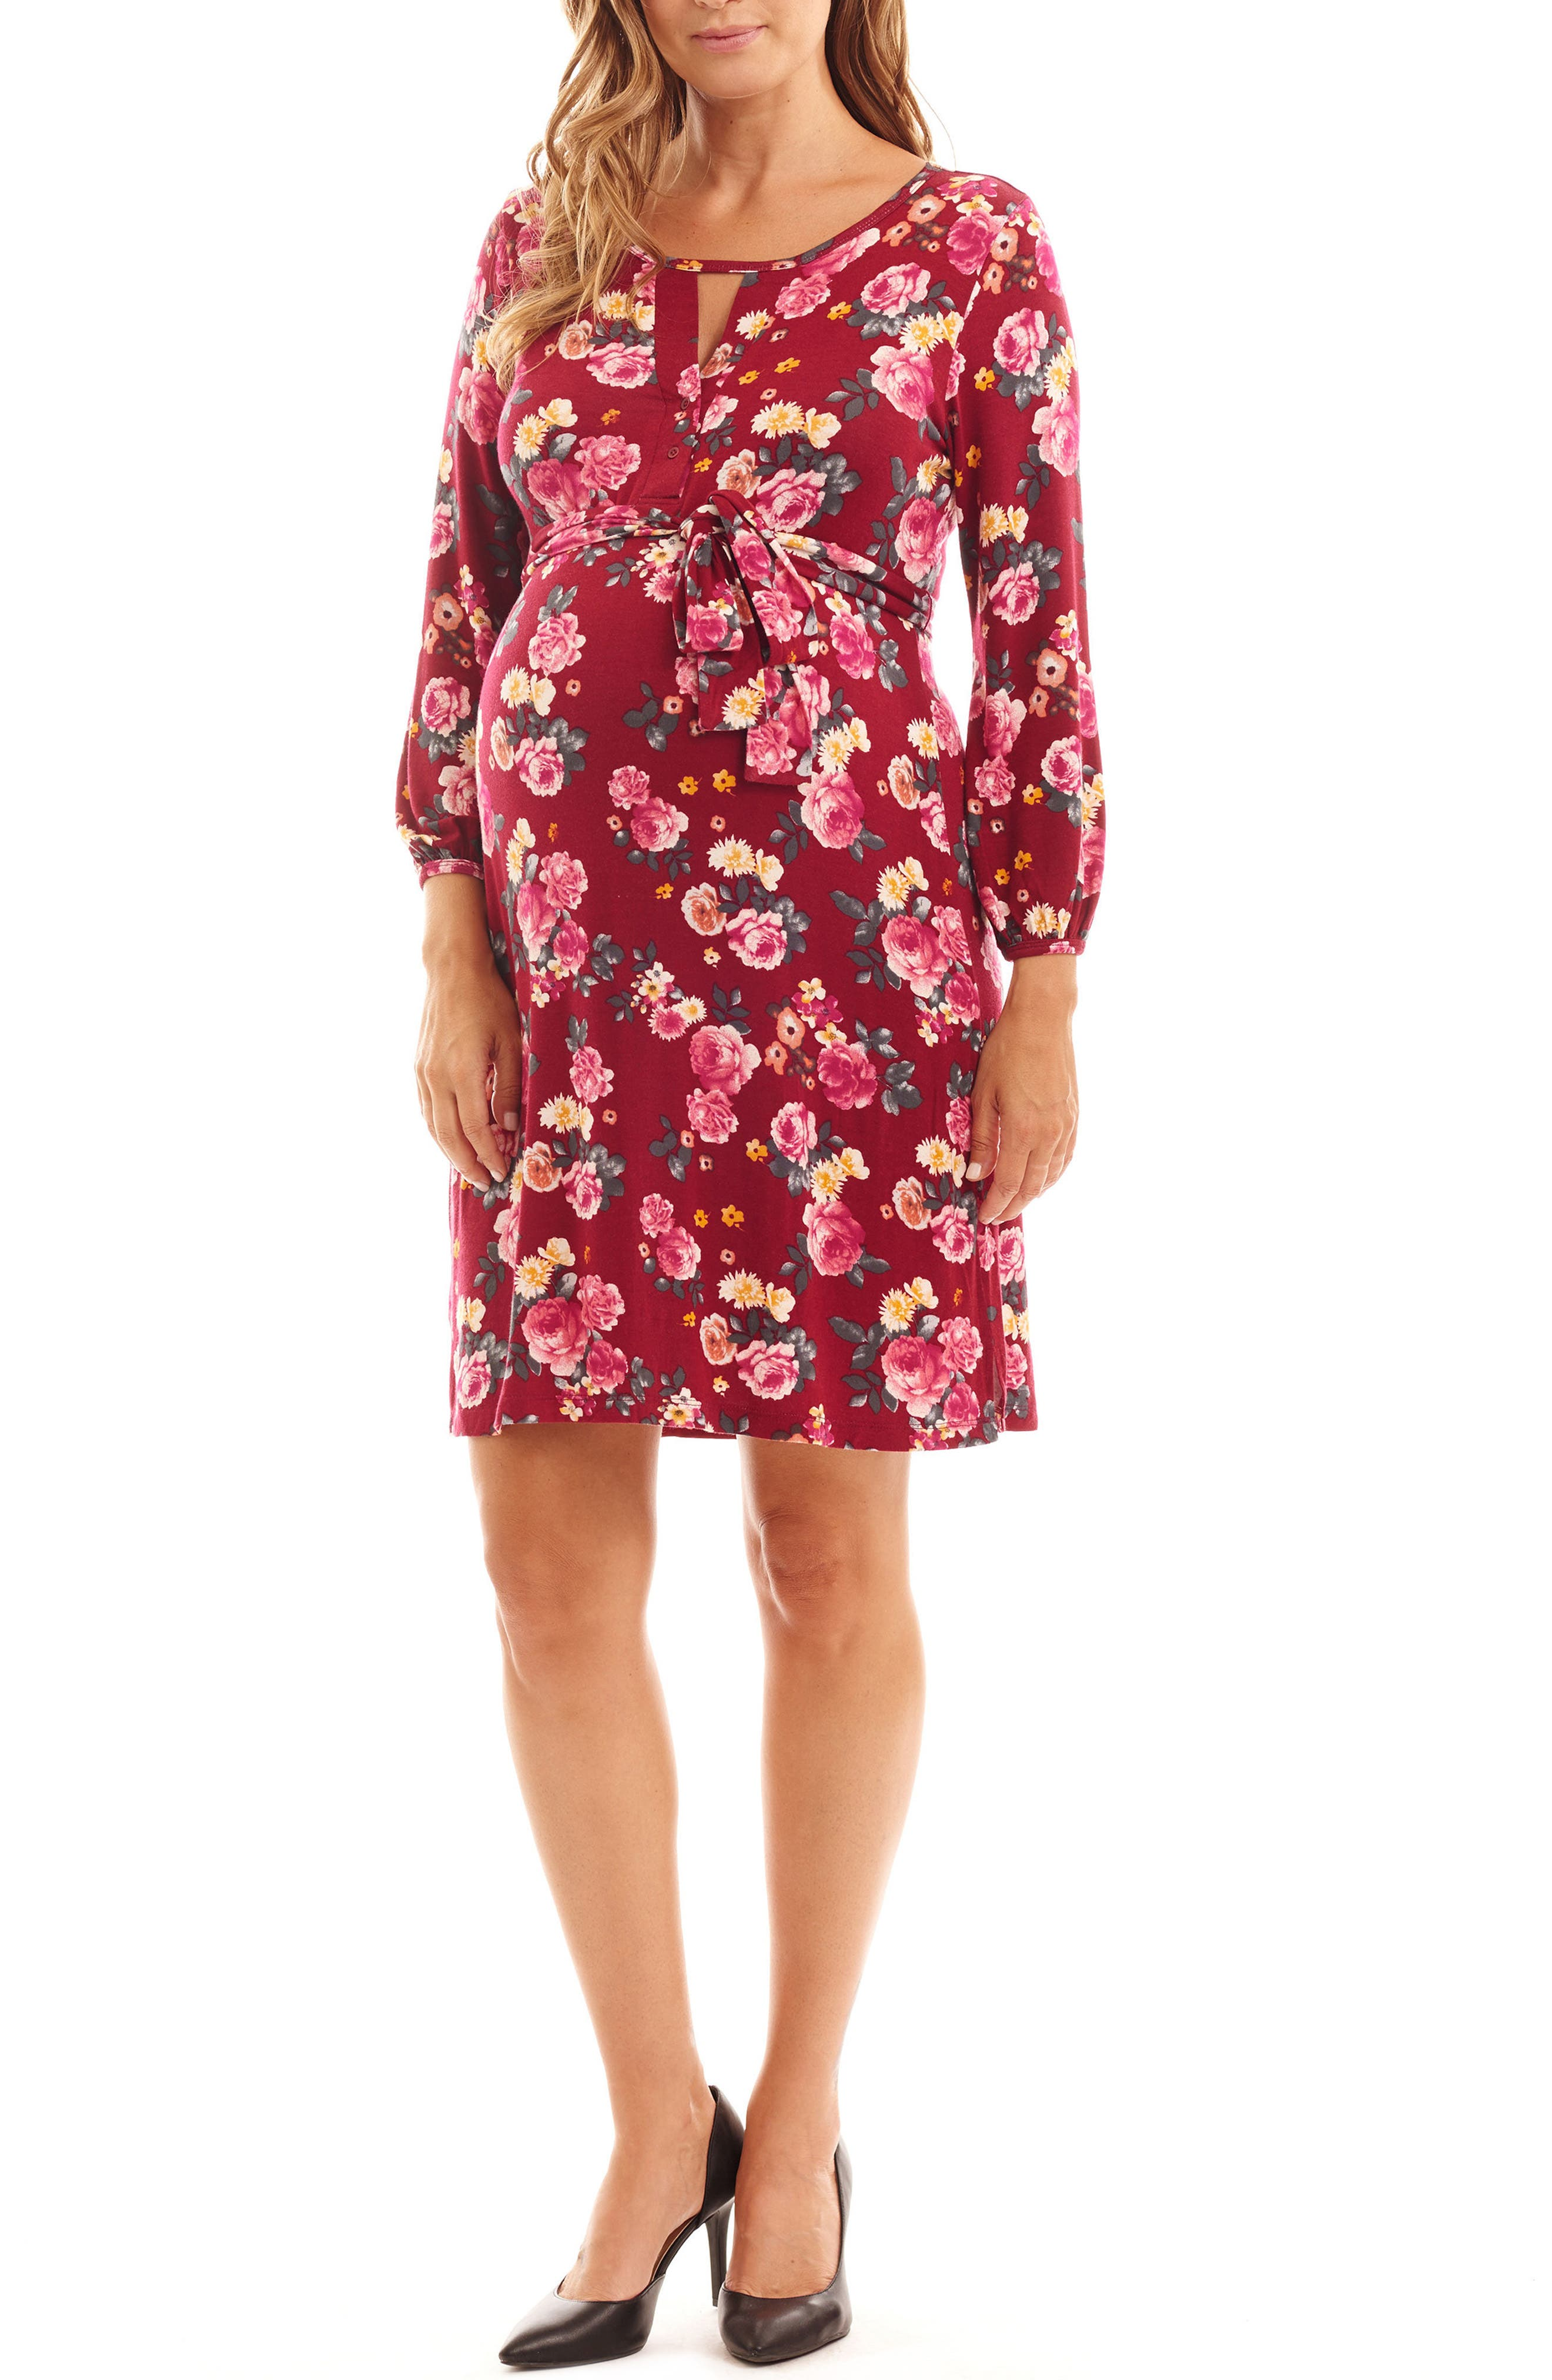 Lonni Maternity/Nursing Shirtdress,                             Alternate thumbnail 2, color,                             BURGUNDY FLORAL